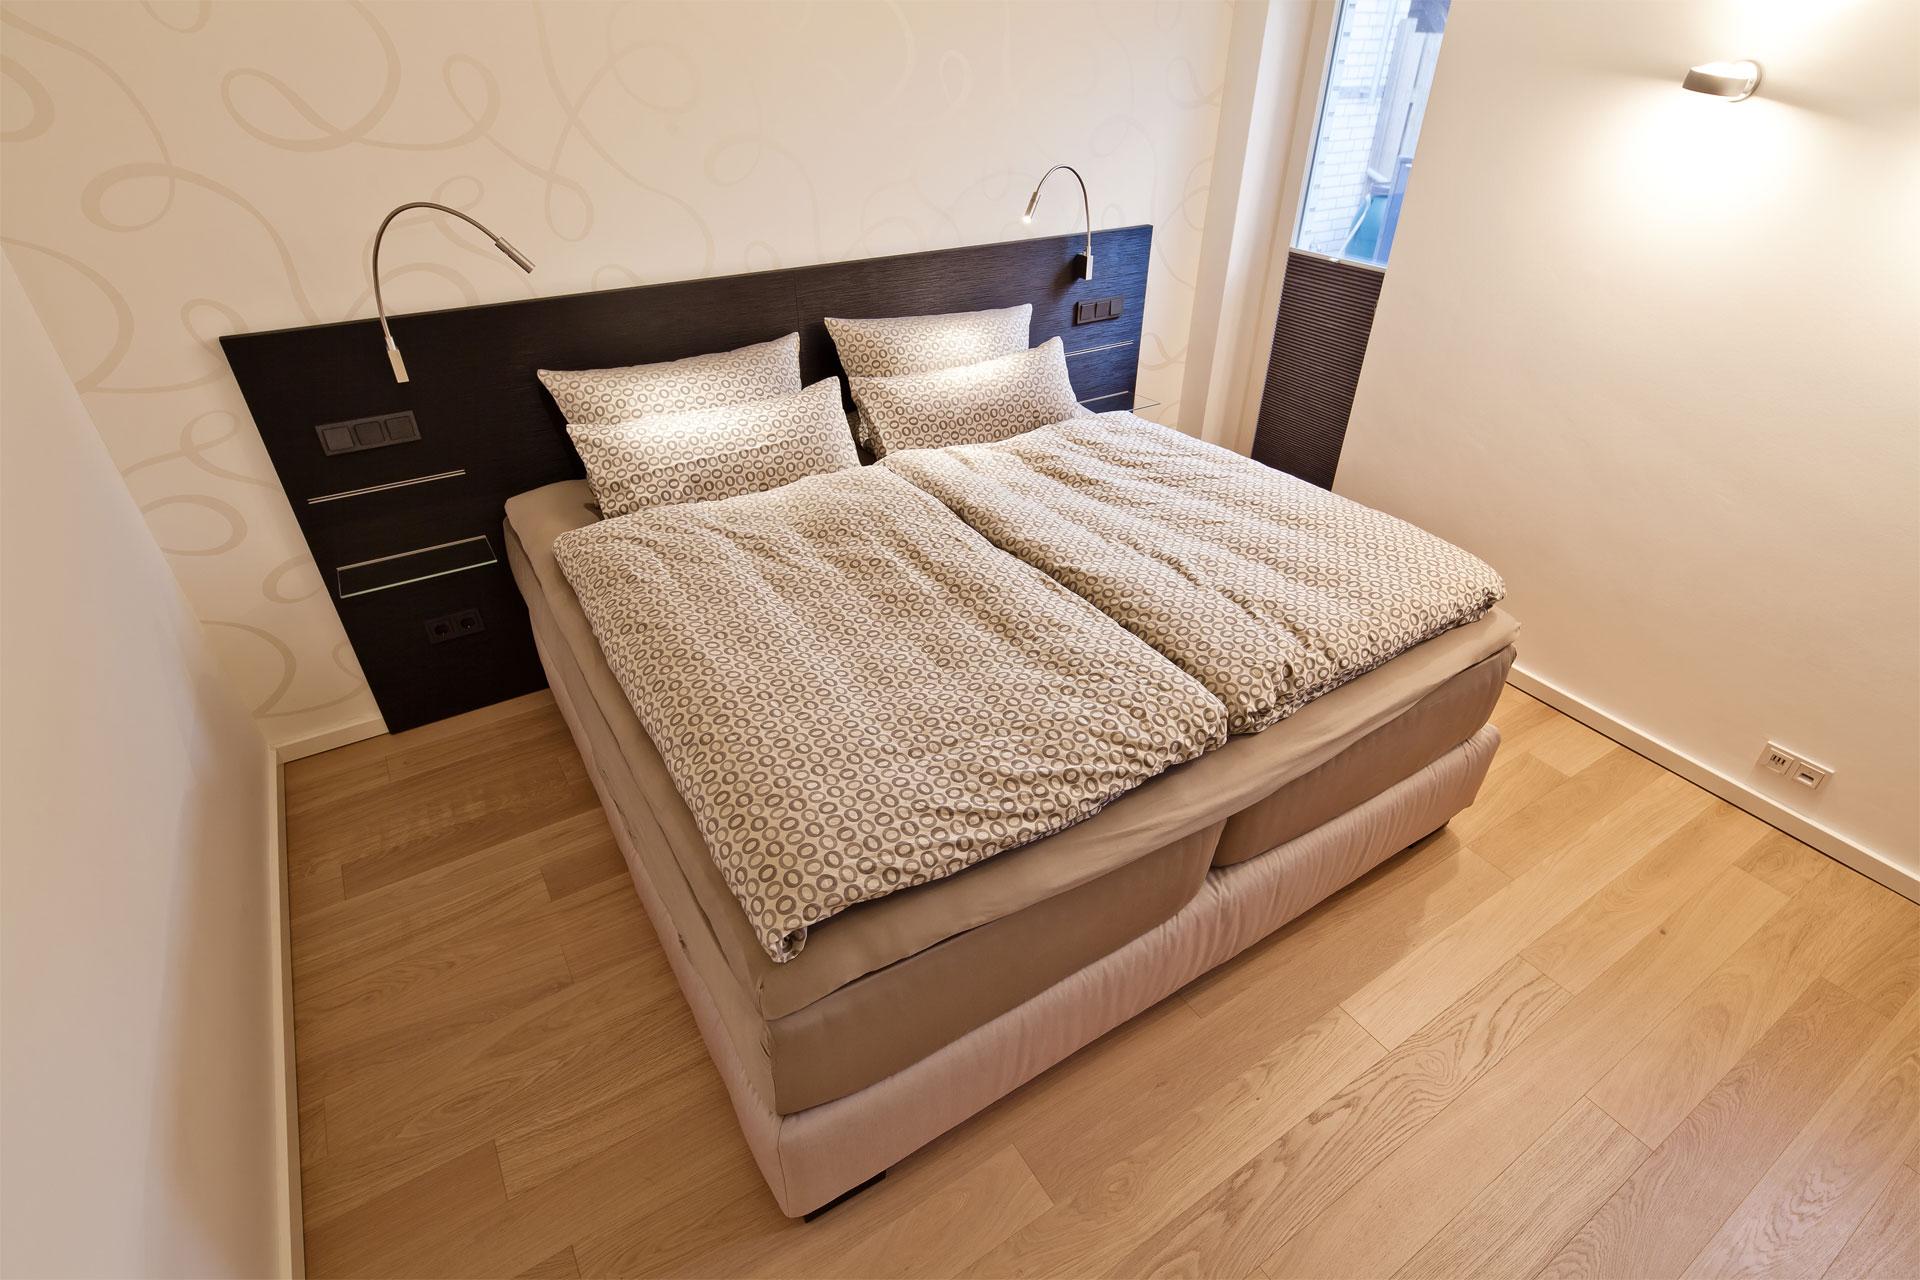 umgestaltung des kleinteiligen schlaf und. Black Bedroom Furniture Sets. Home Design Ideas